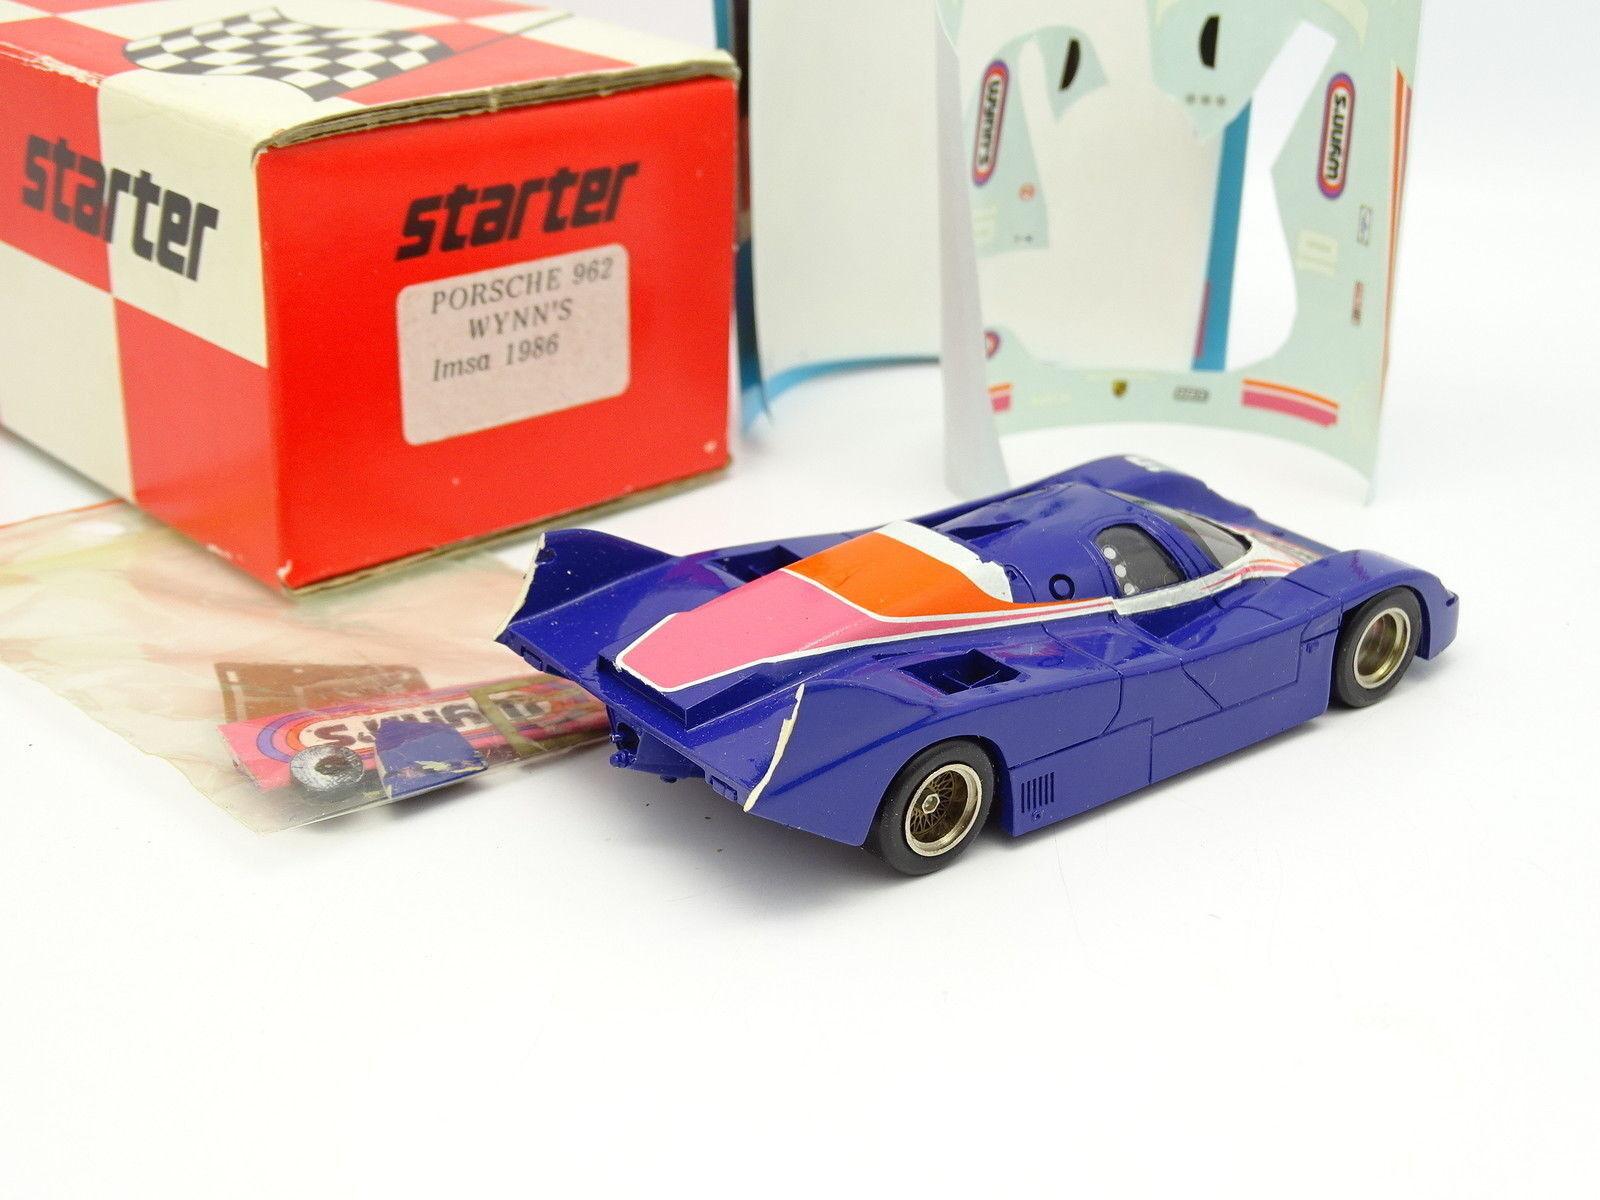 Starter Kit à Monter 1 43 43 43 - Porsche 962 Wynn's IMSA 1986 cffe76